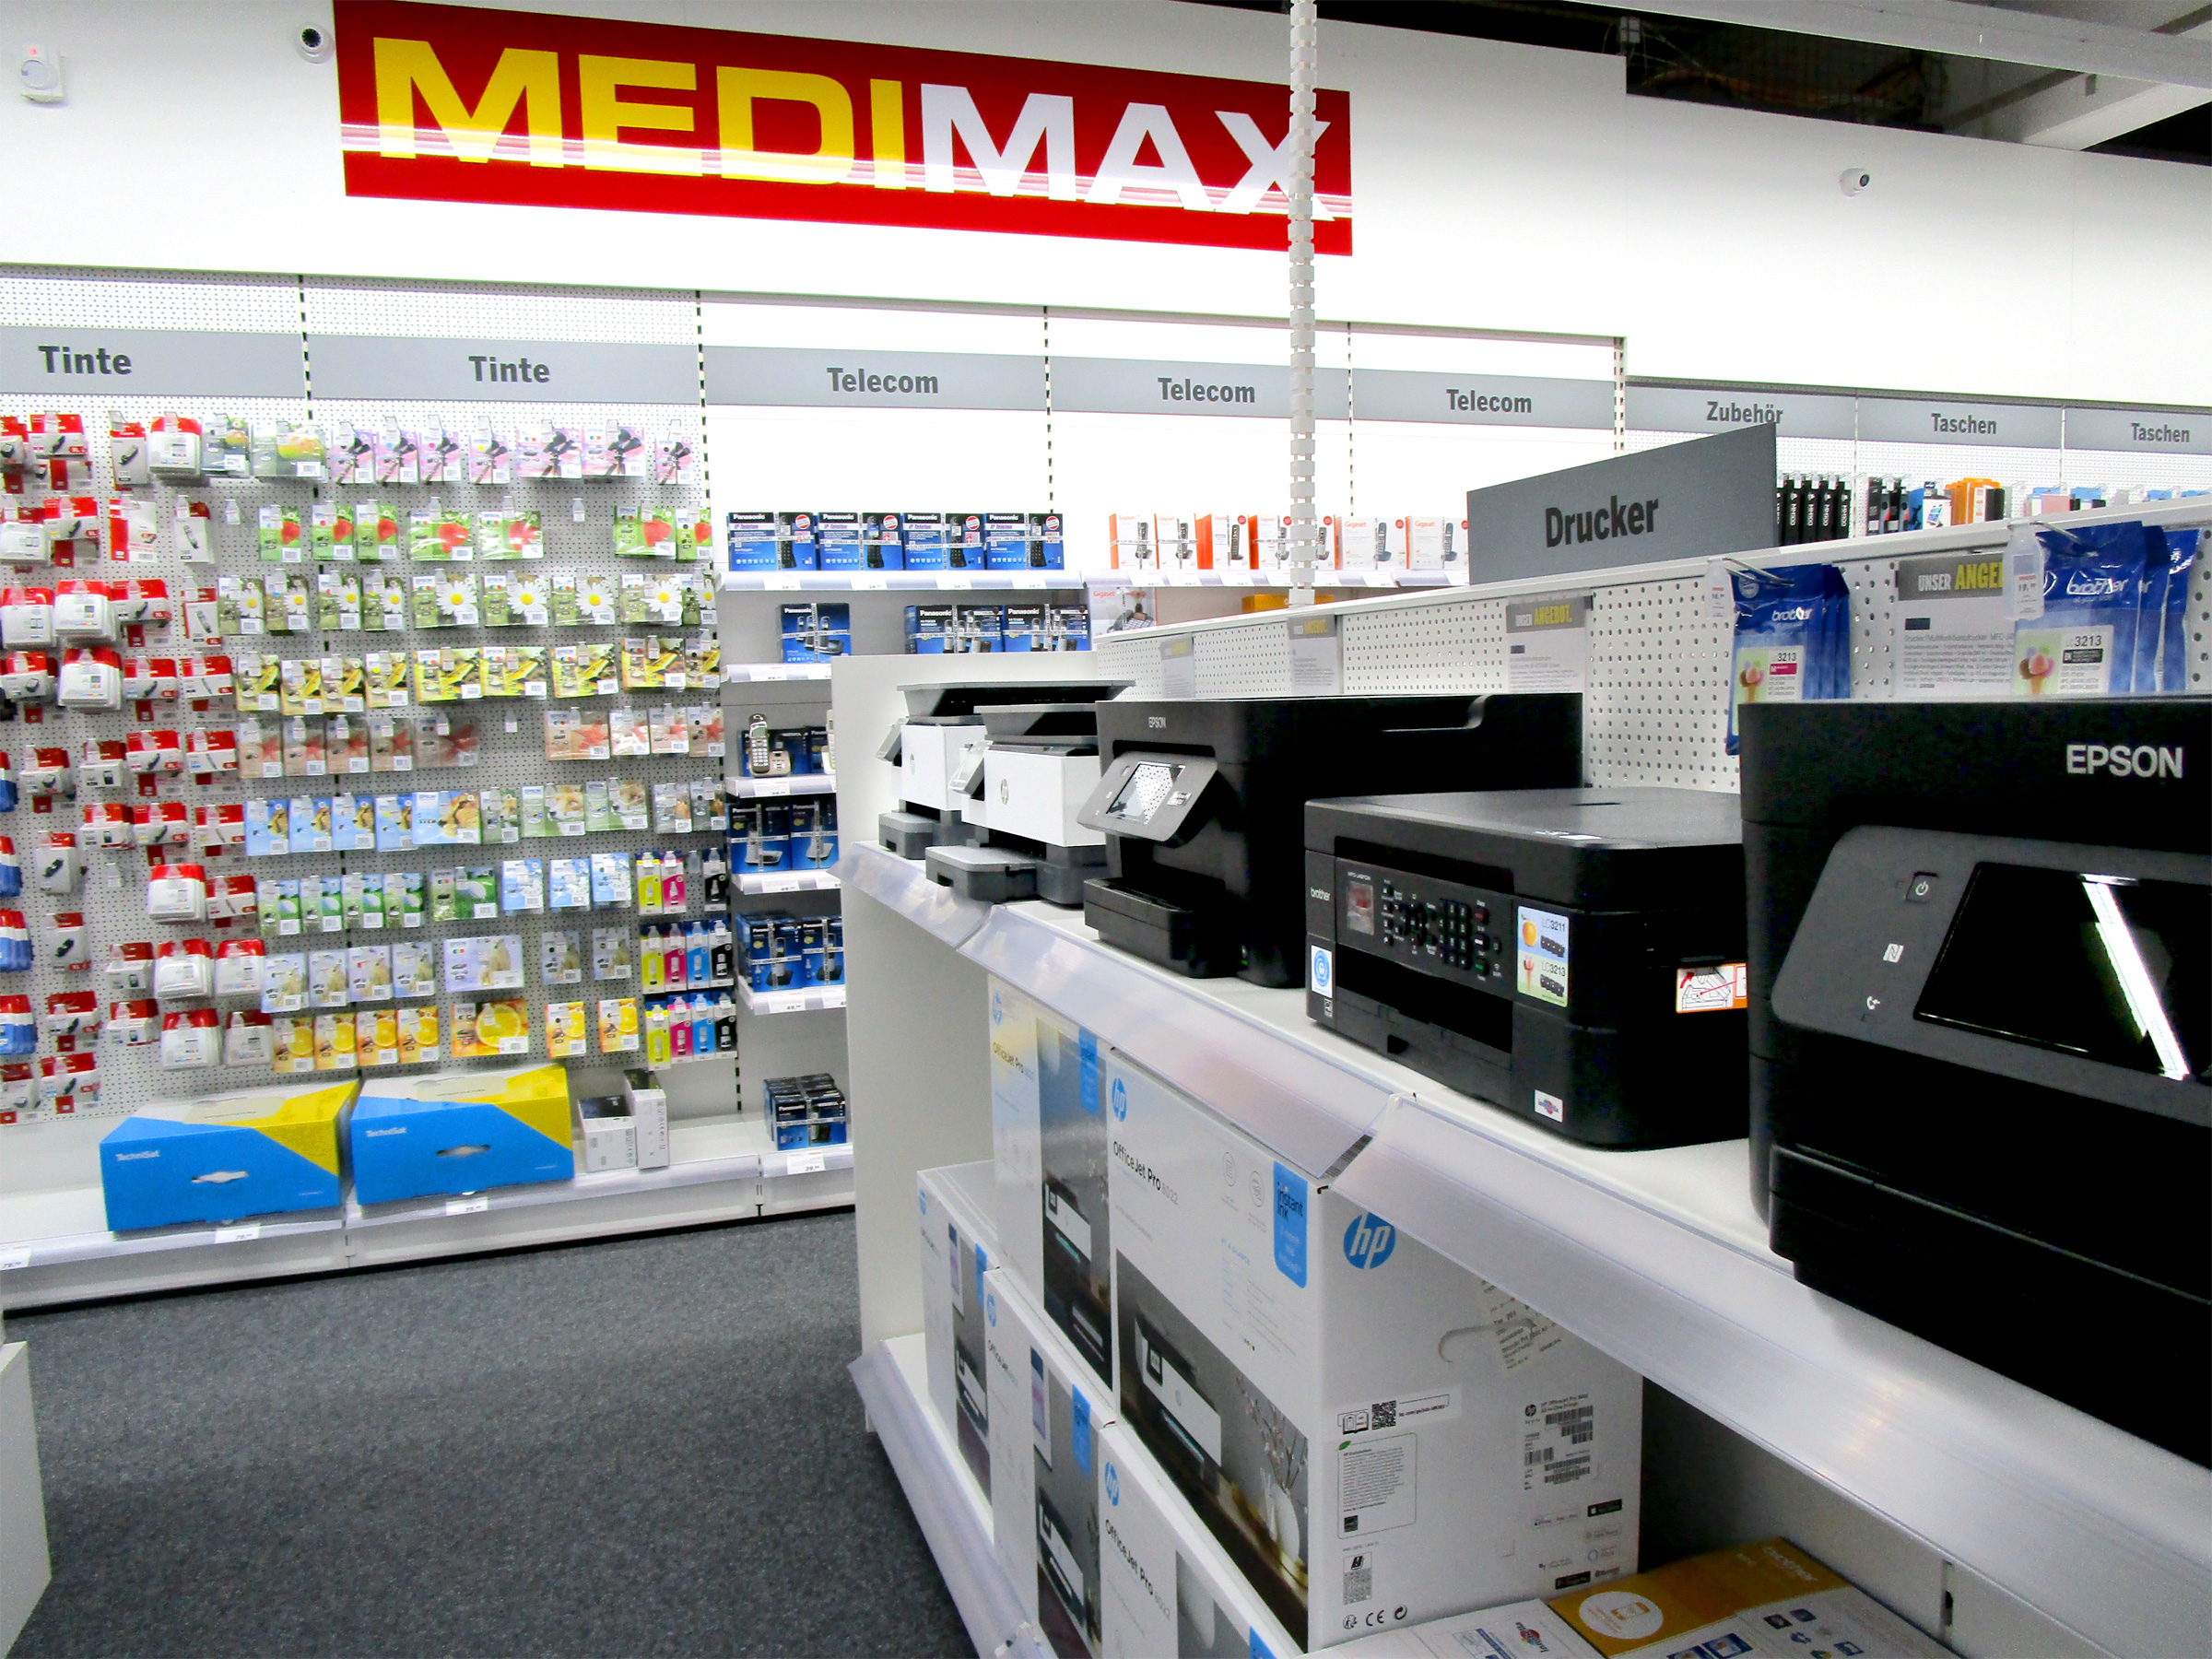 Medimax_3297_202005